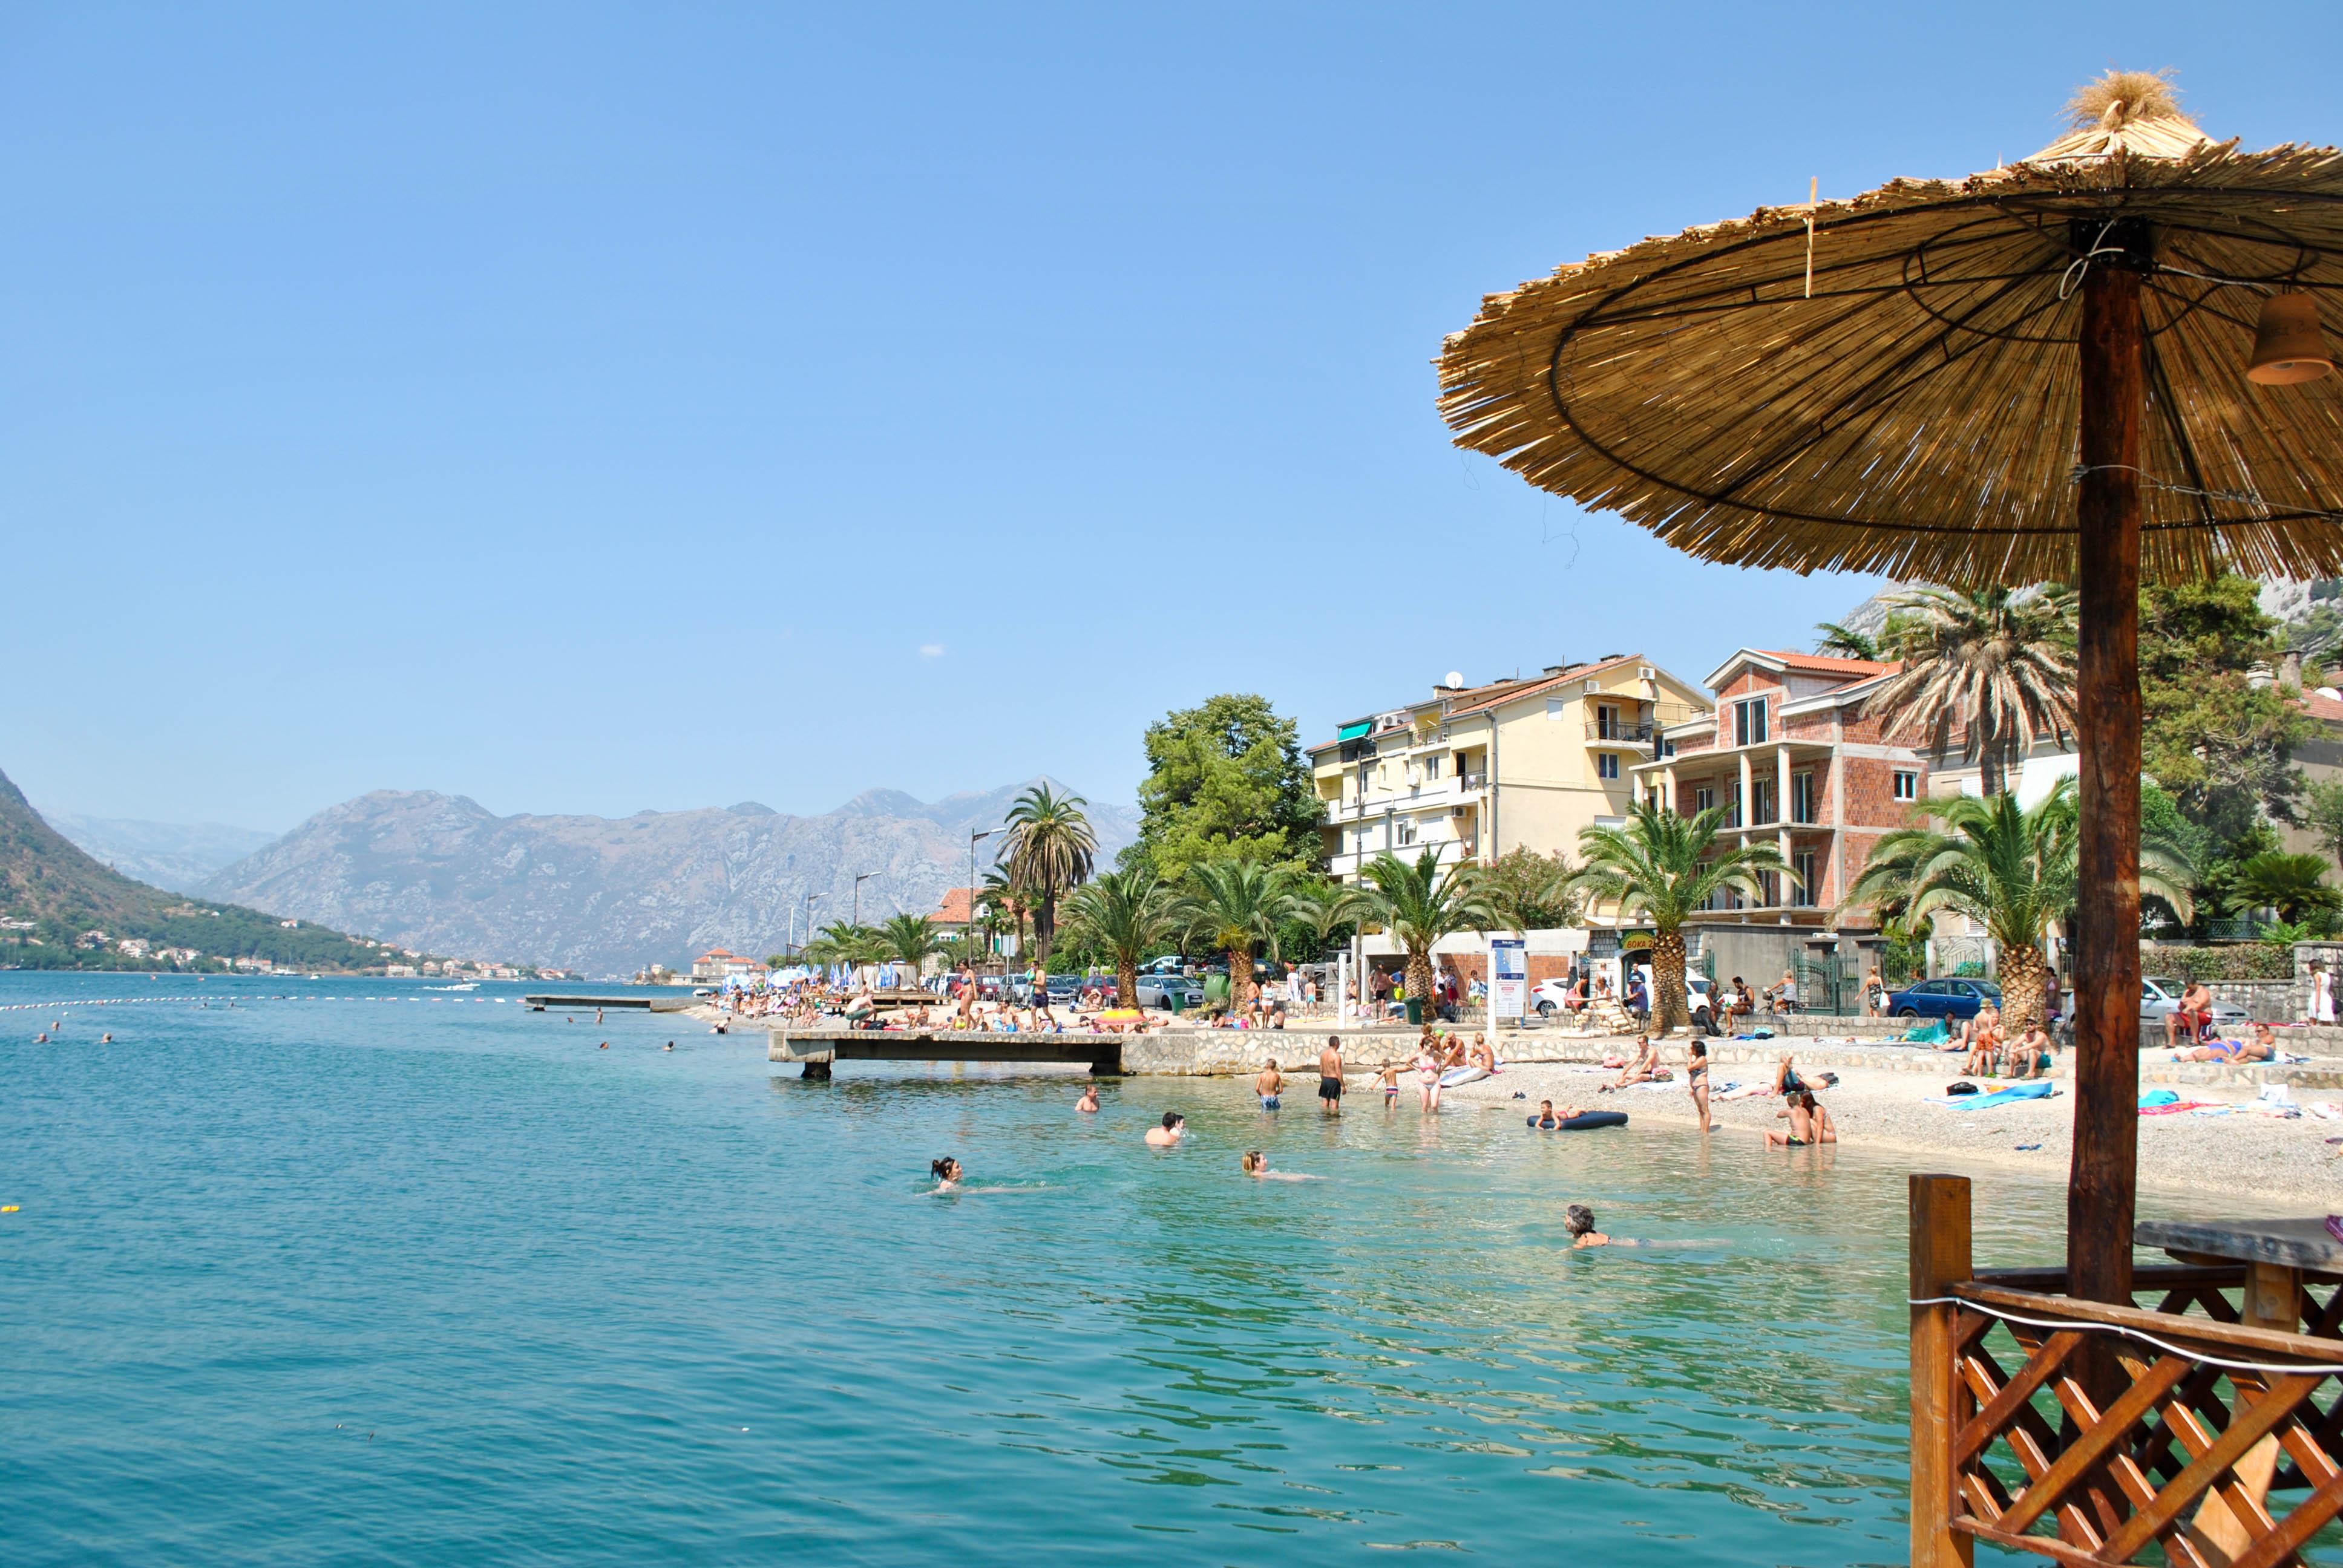 Lingering on the Adriatic Coast